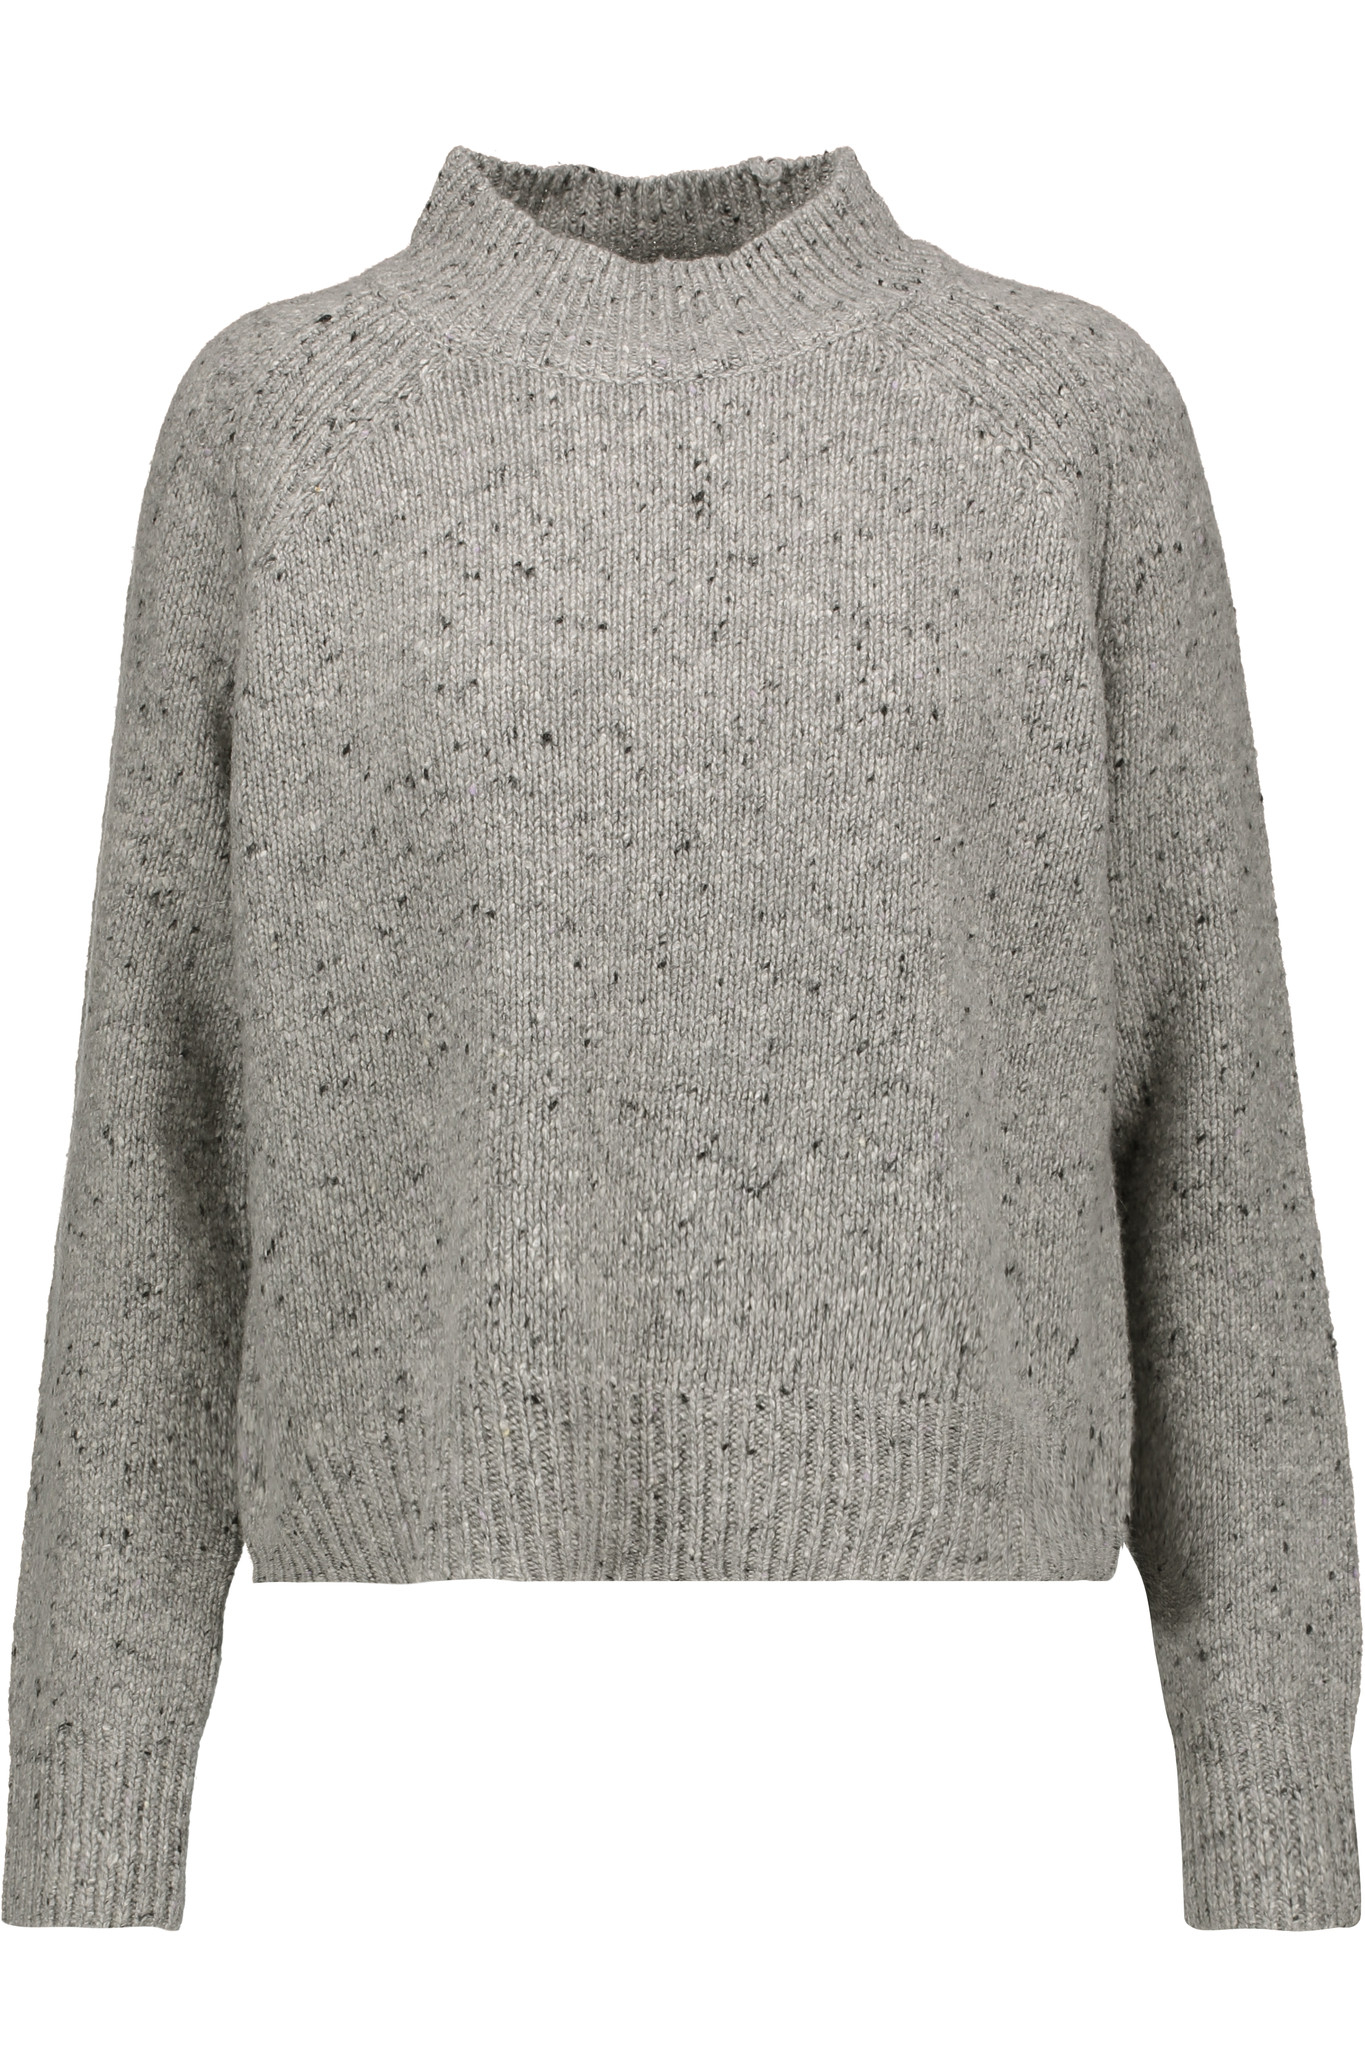 Lyst Rebecca Minkoff Banga Merino Wool Blend Sweater In Gray